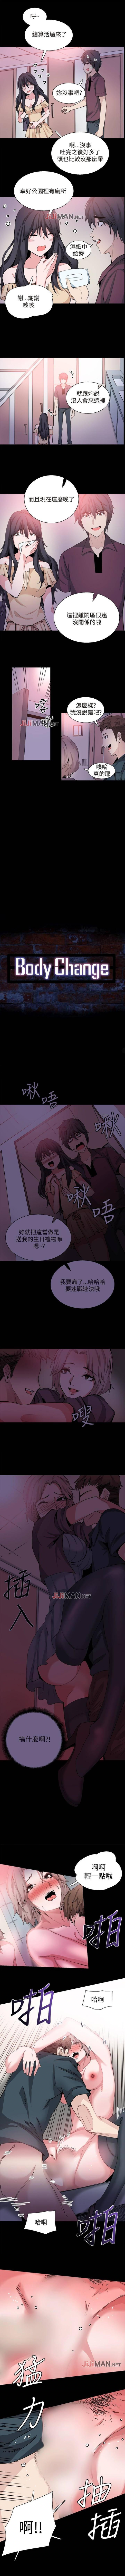 【已完结】Bodychange(作者:Seize & 死亡節奏) 第1~33话 145